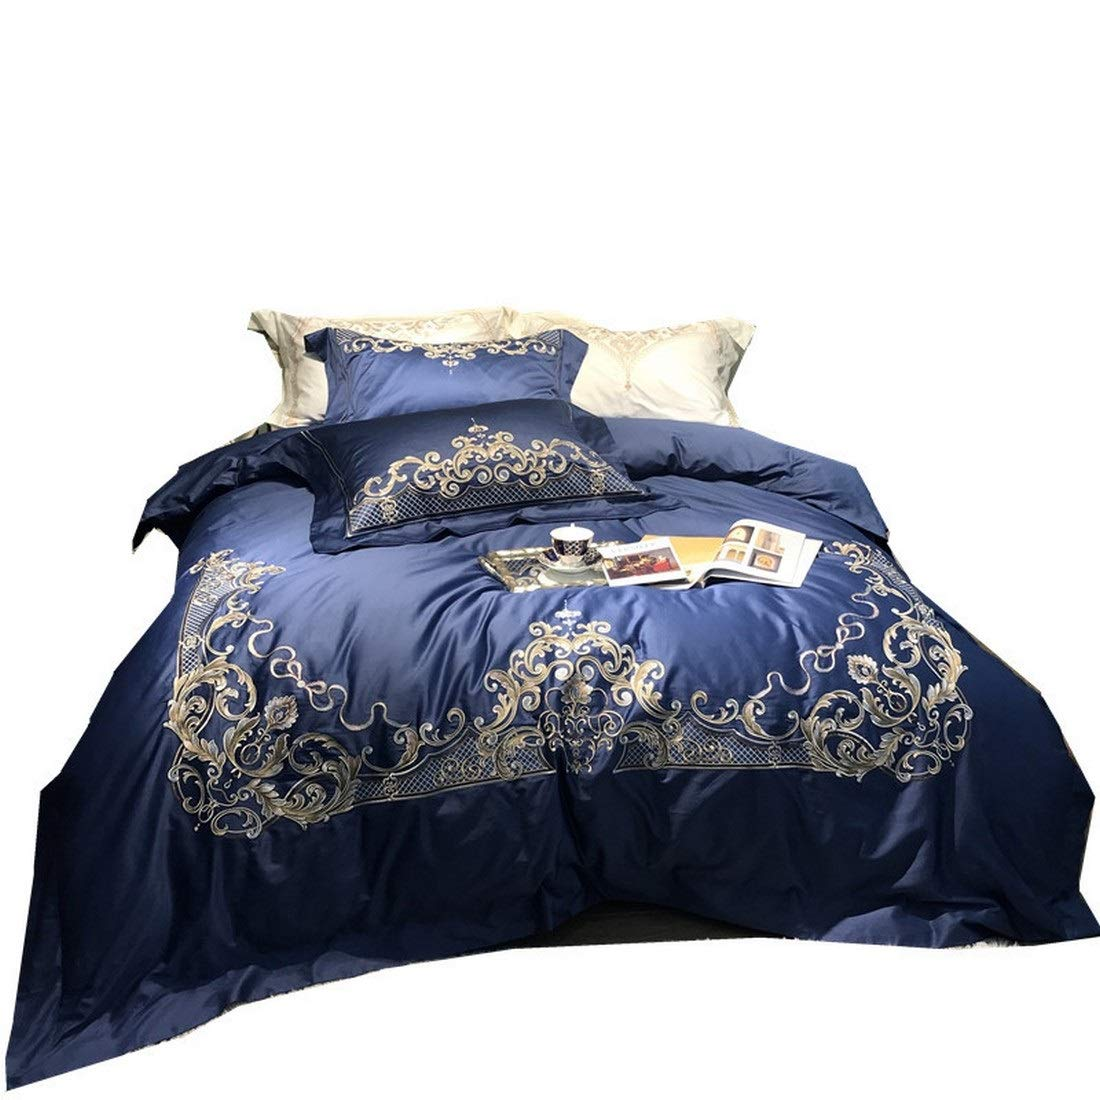 Kainuoo 契約ロングステープルコットン刺繍ブルーコットン寝具4セット (Color : Carola-dark blue, Size : QUEEN) B07N838X4C Carola-dark blue Queen